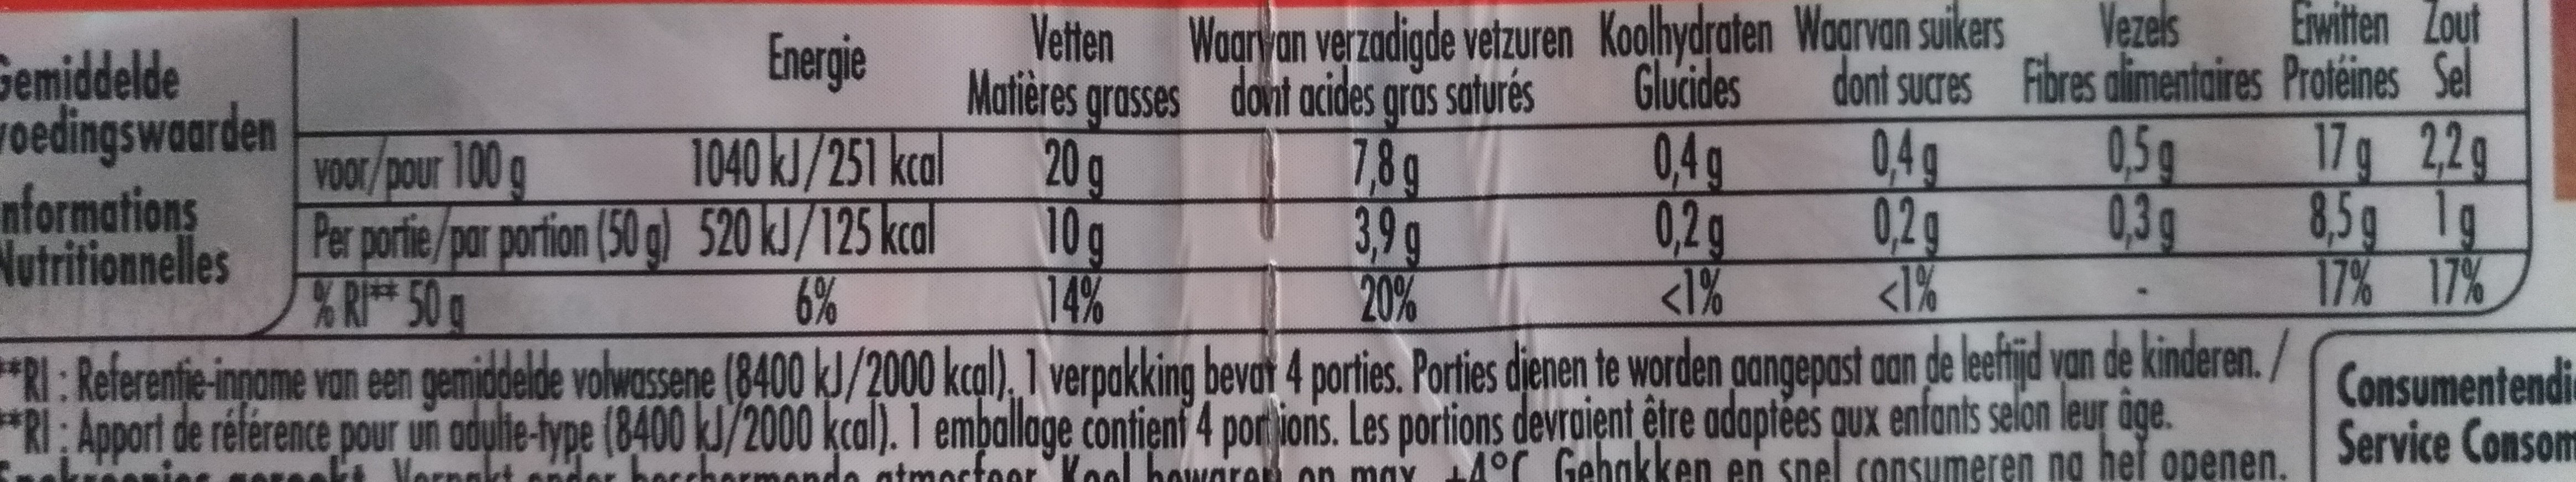 Allumettes de lardon - Nutrition facts - fr